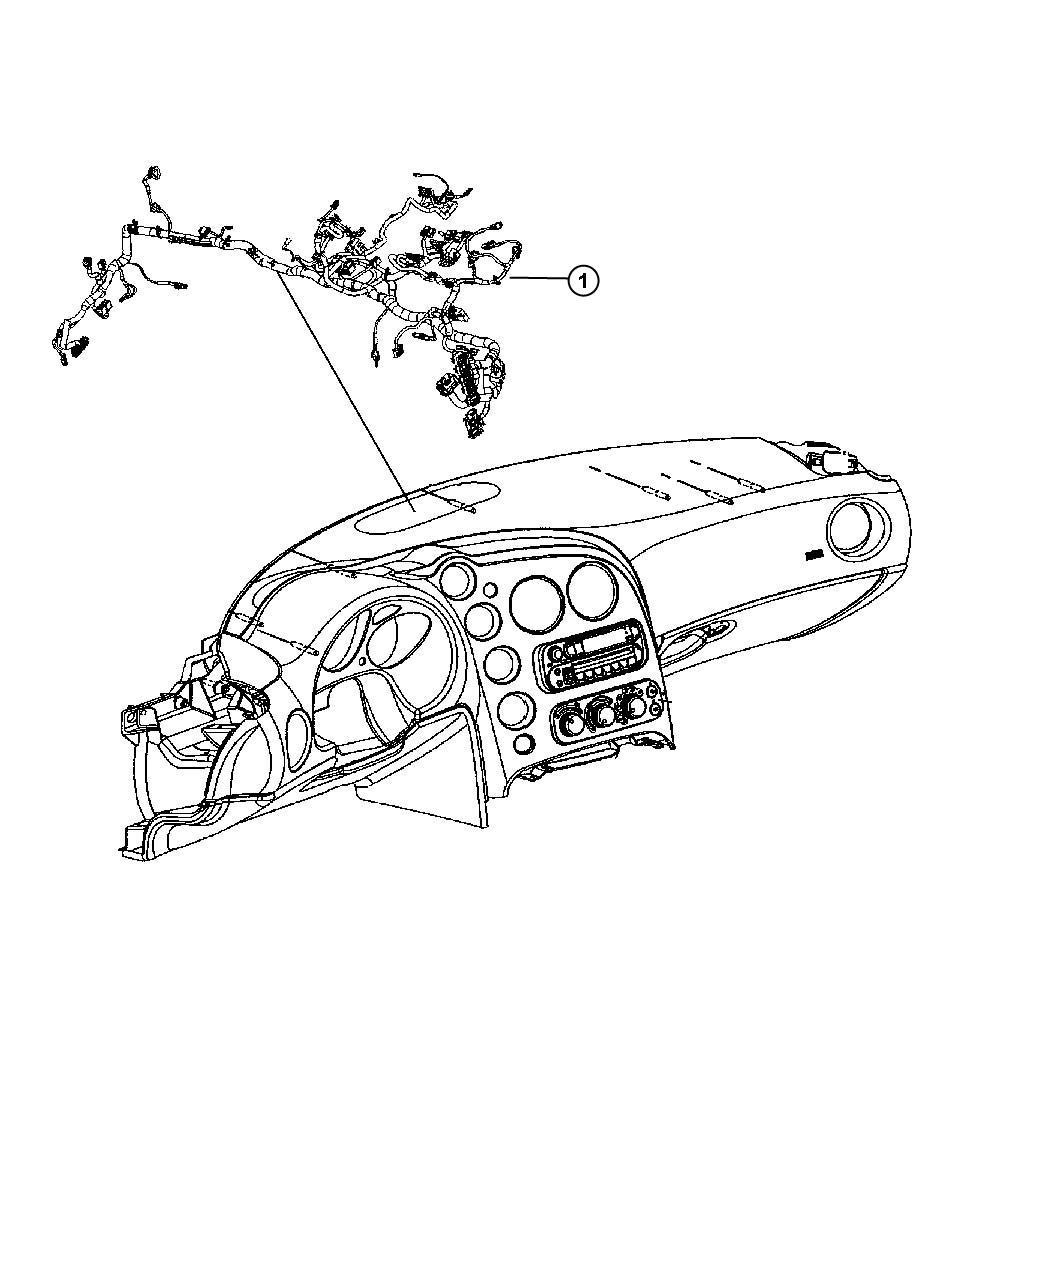 Dodge Viper Wiring. Instrument panel. Trim: [all trim